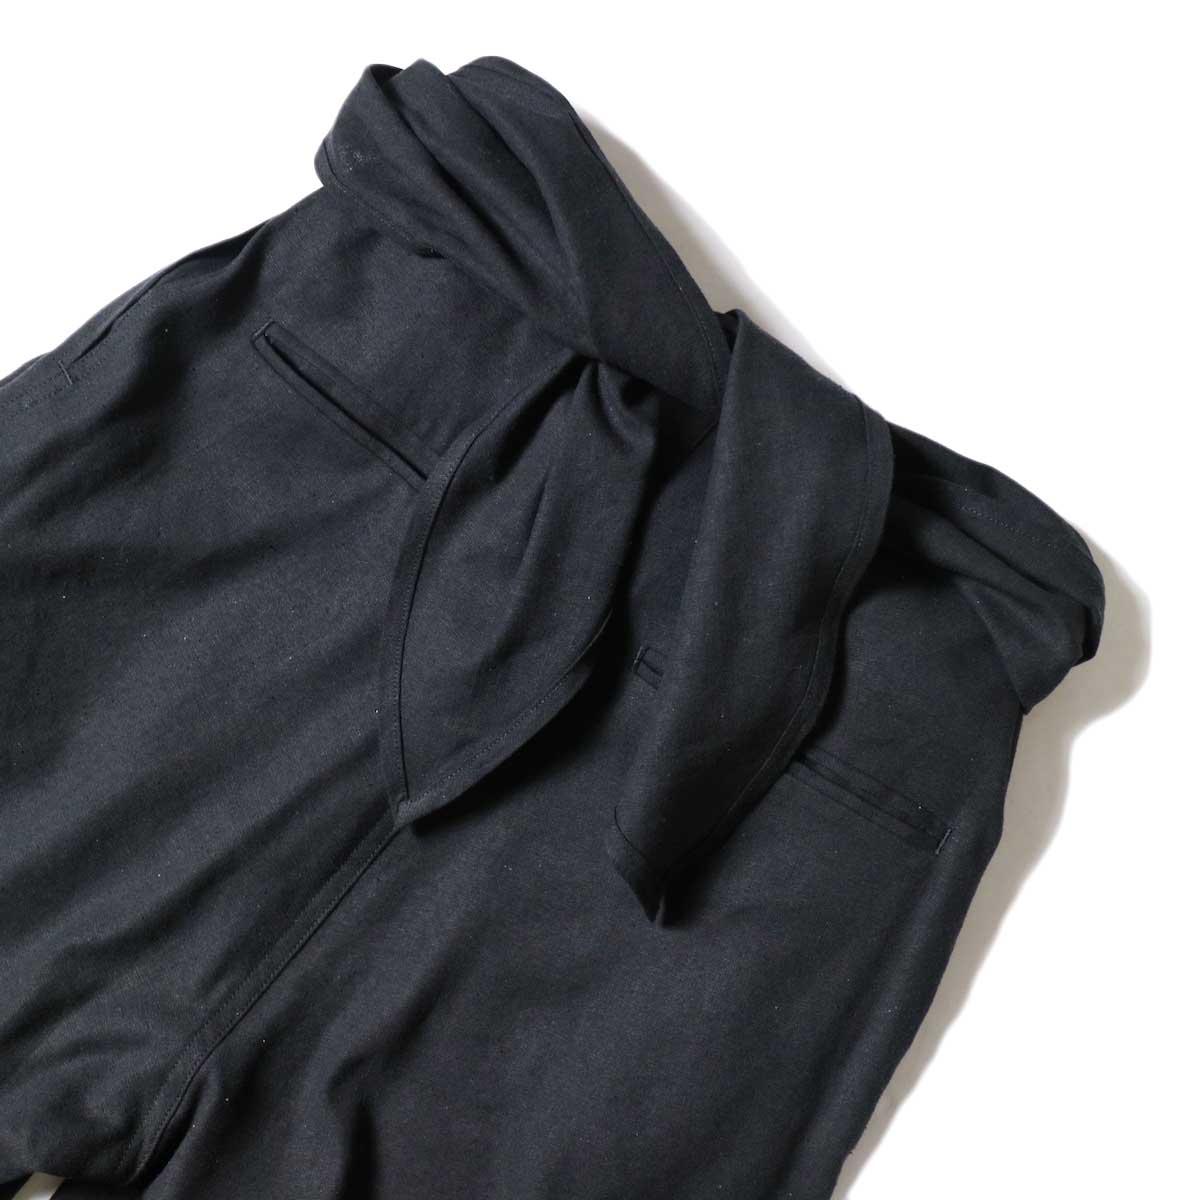 ARCHI / S/L NEP WRAP SLACKS (Black) ウエスト背面①